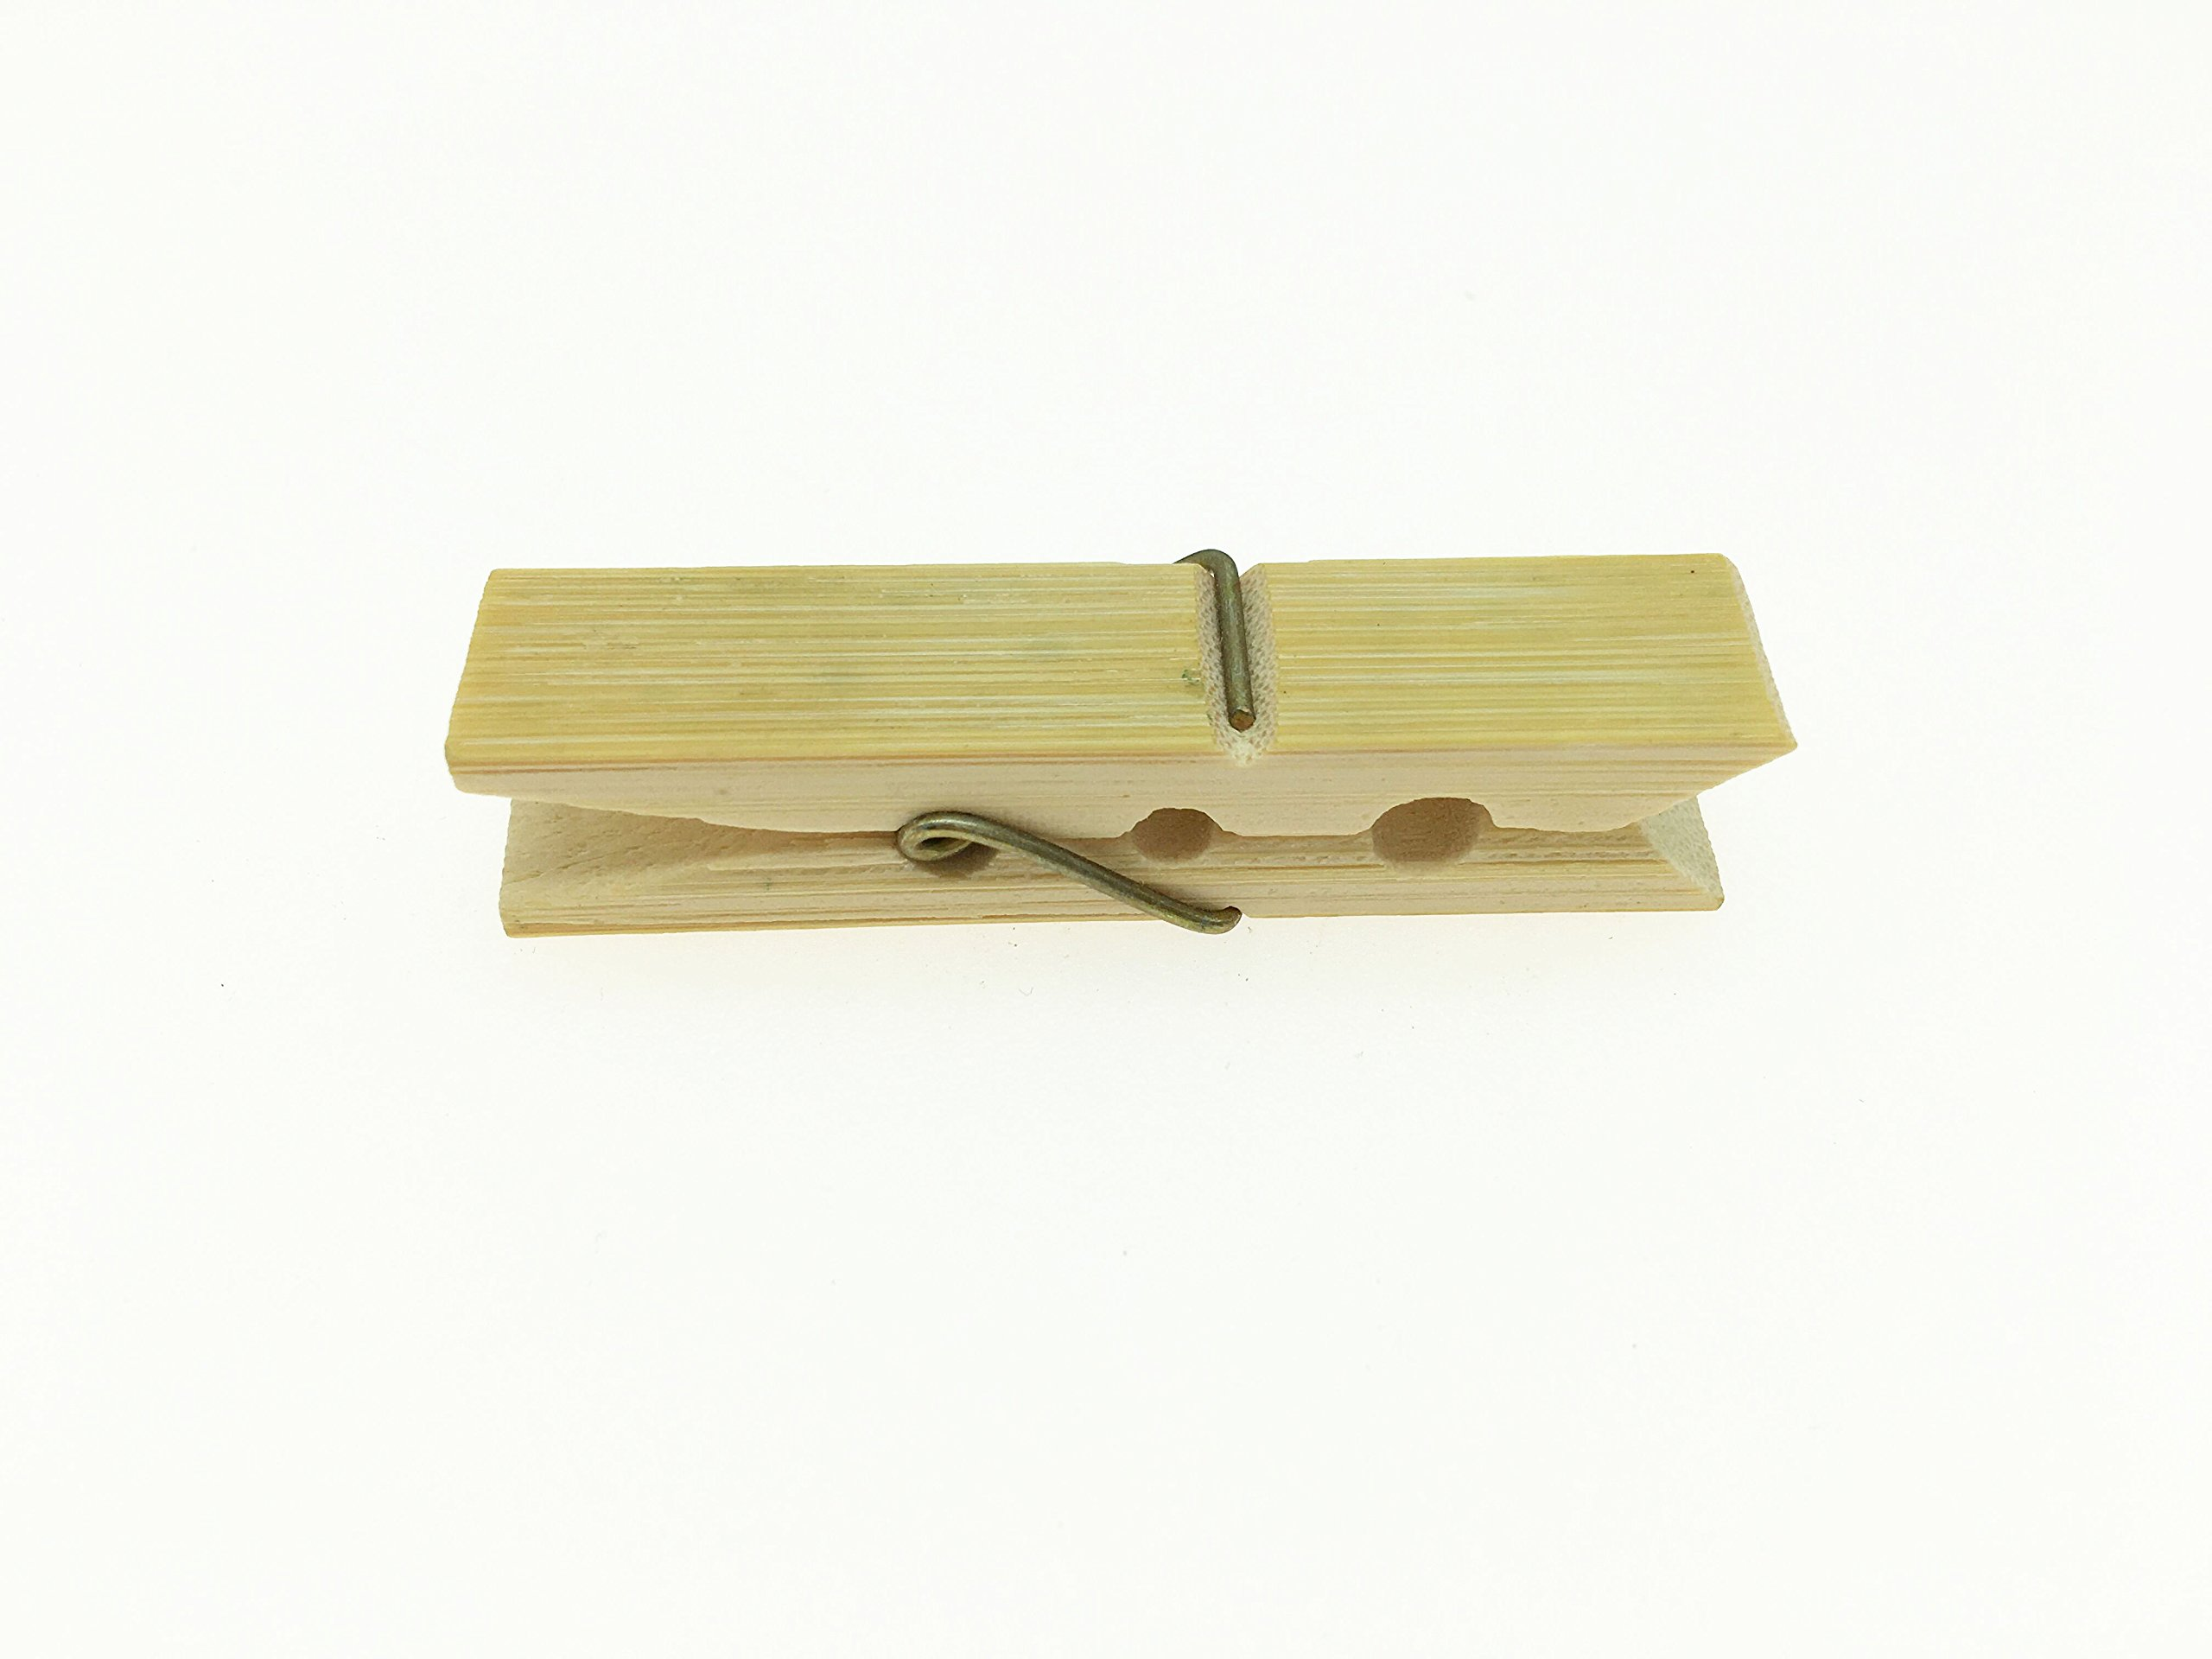 KKhouse 20 PCS Natural Bamboo Clothespins Mini Photo Paper Peg Pin Graft Clips 6CM Art Craft Photo Hanging Clips